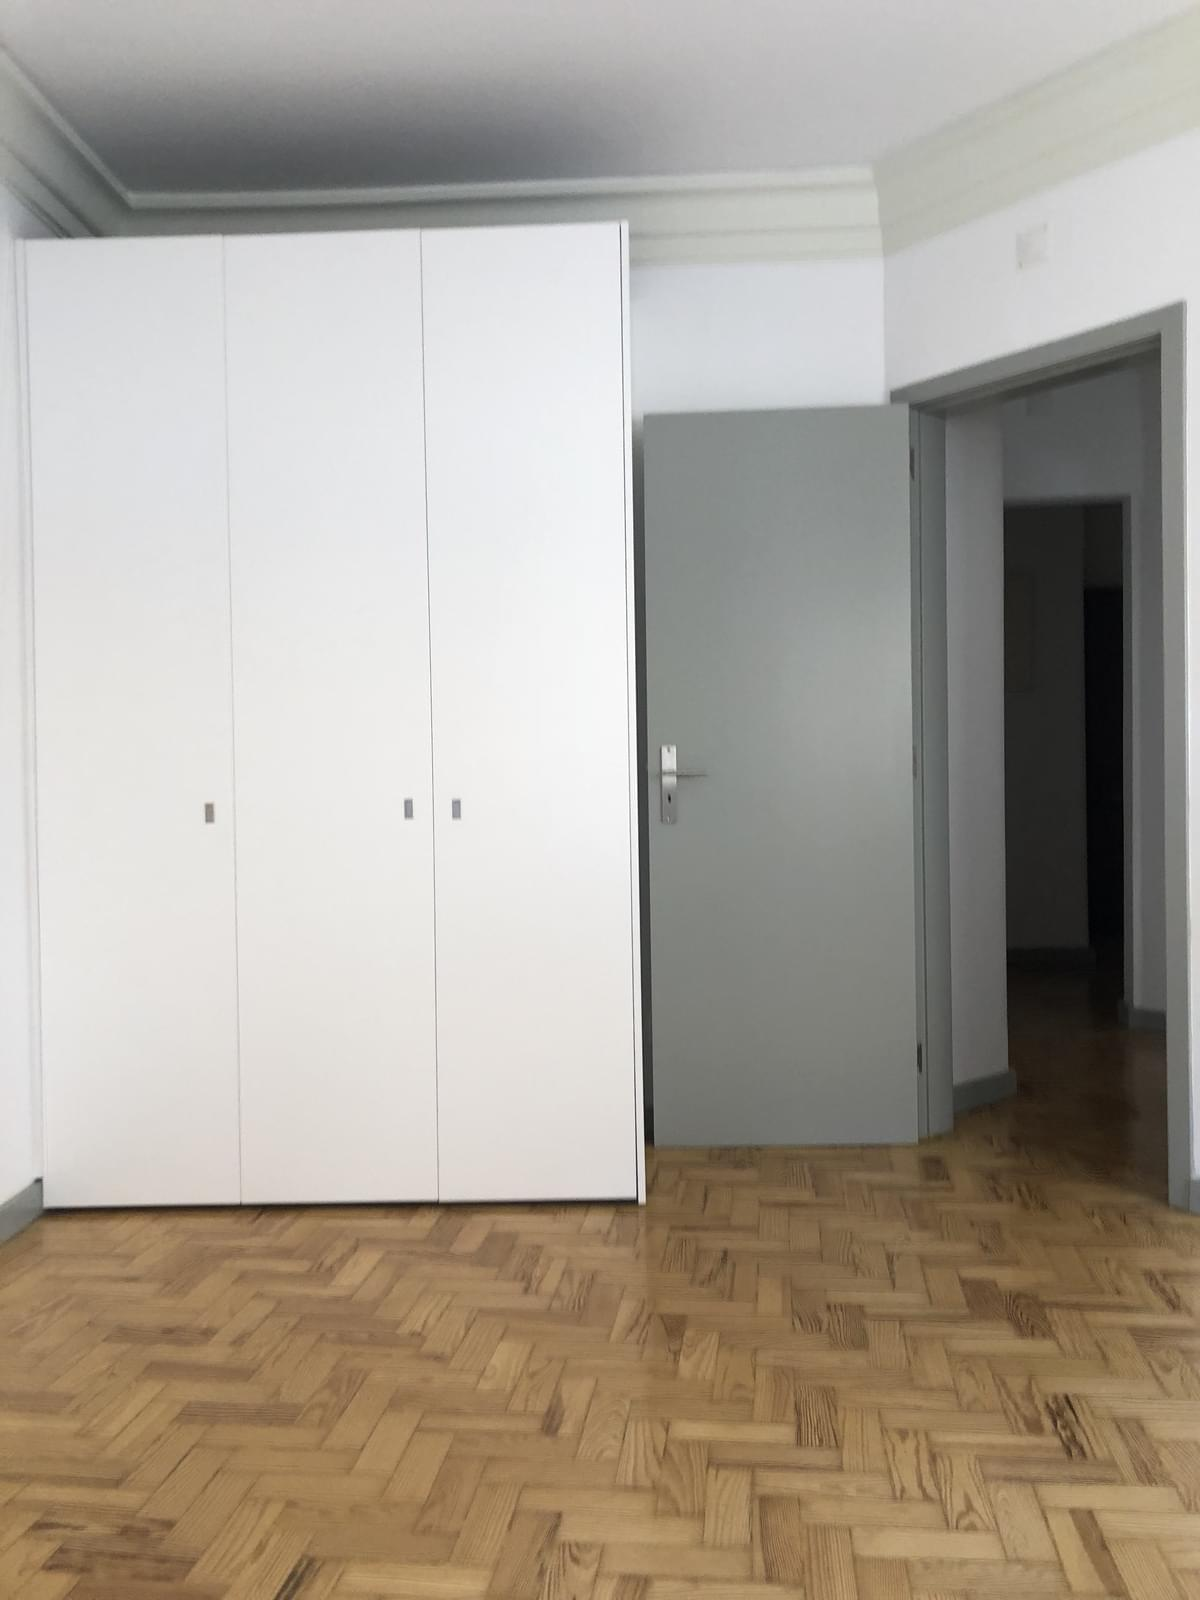 pf17234-apartamento-t3-lisboa-f5534a88-ec1e-4480-a5fc-e05798c23e89